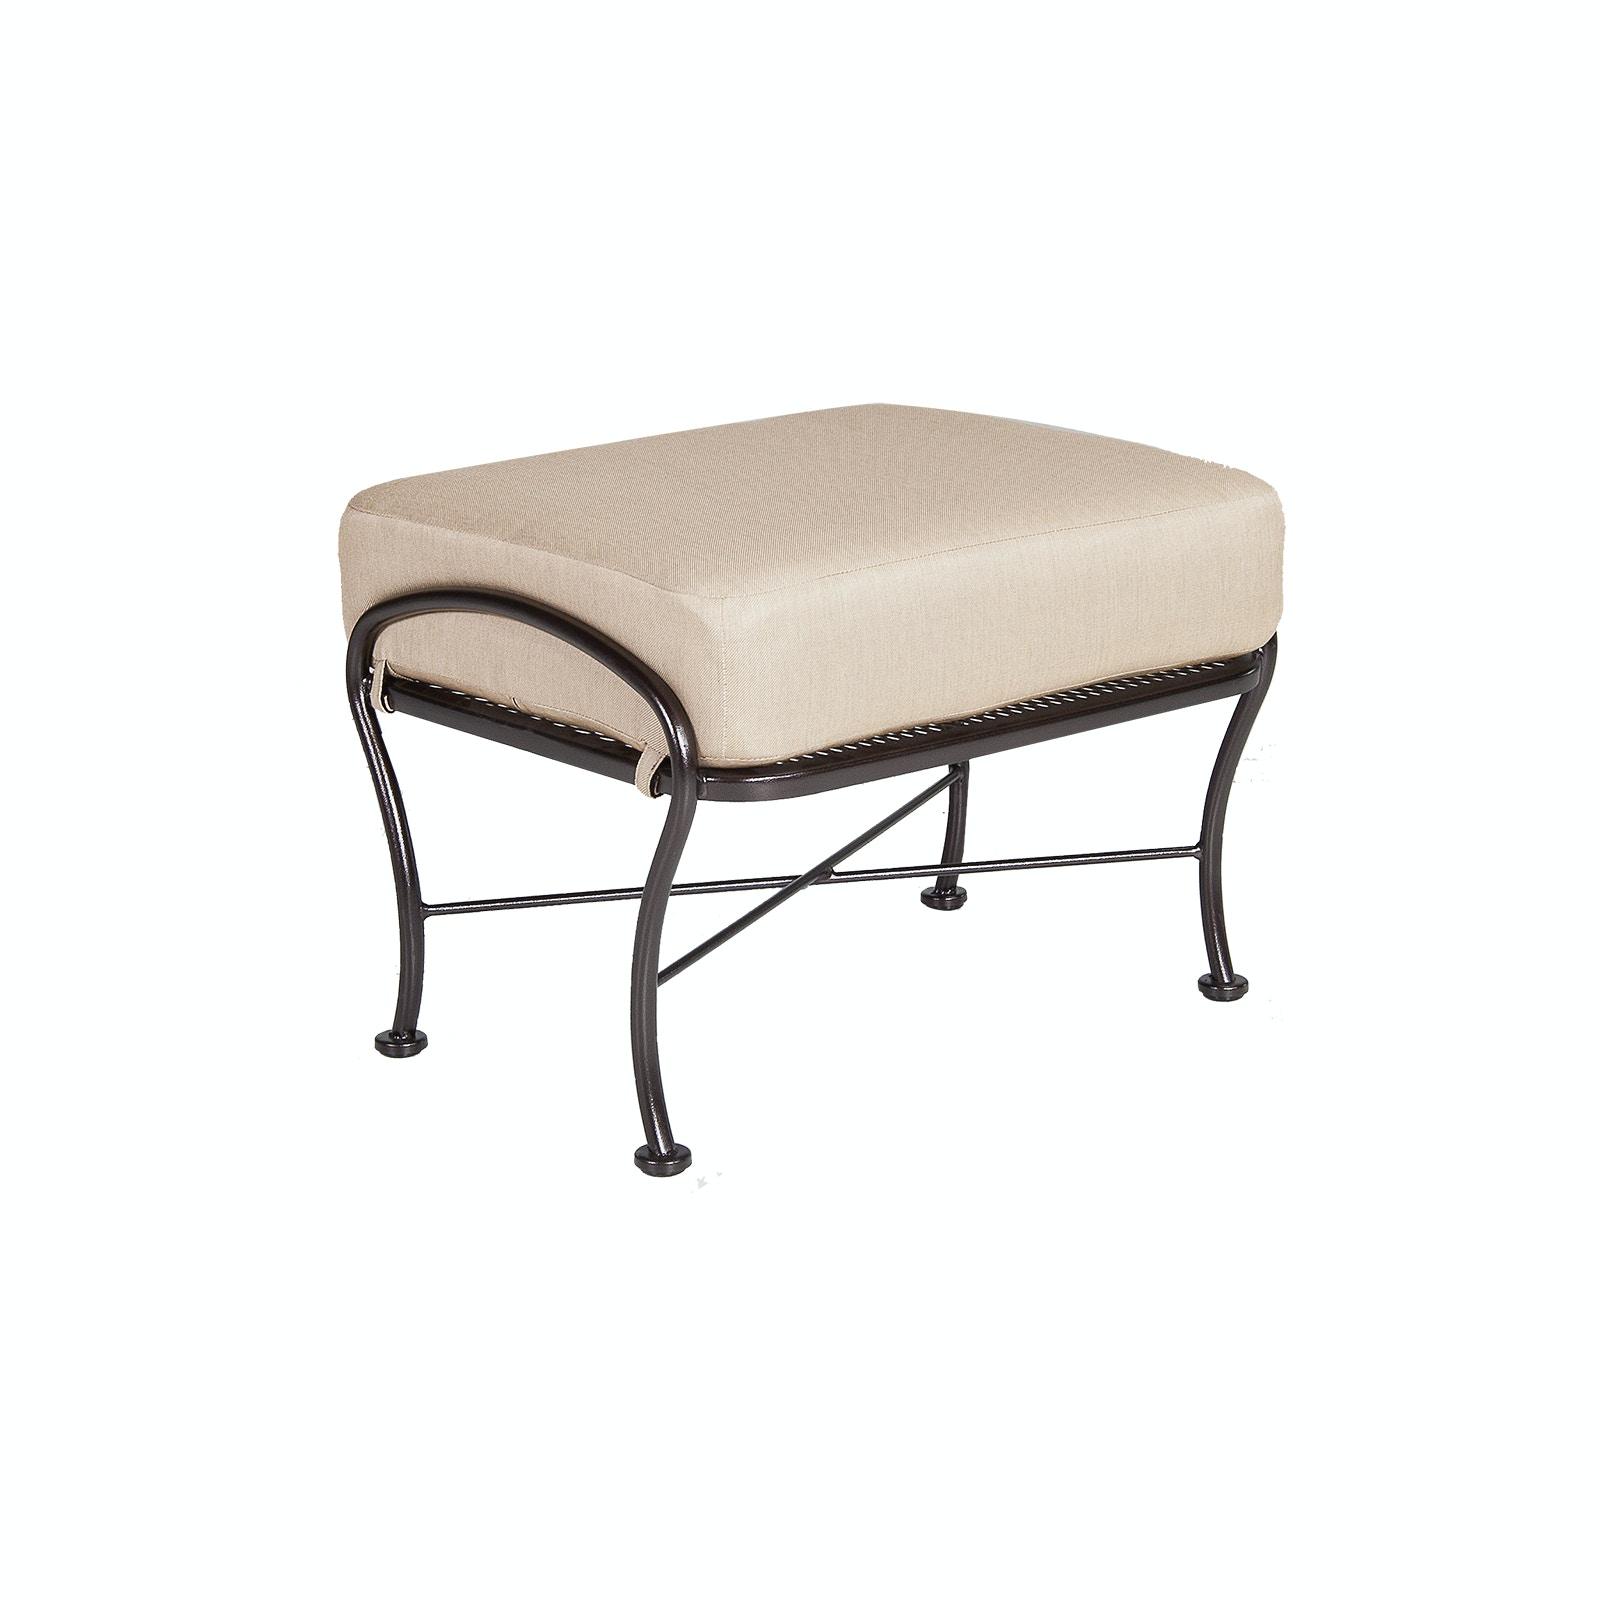 OW Lee Furniture Cambria Ottoman 17130 O